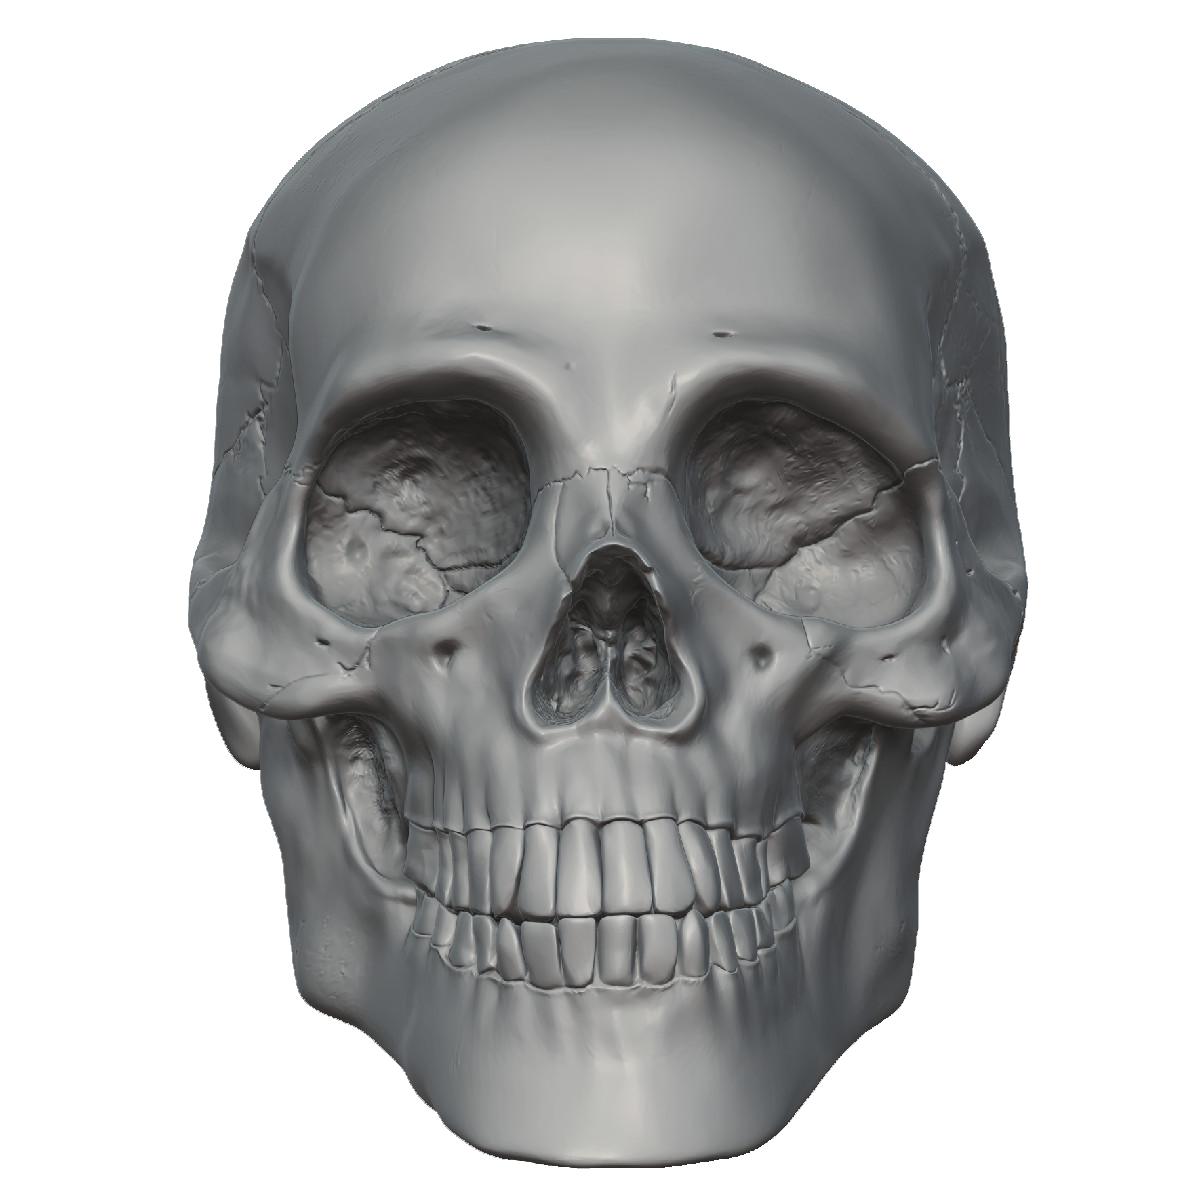 Download PNG image - Skeleton Head Free Png Image - PNG Skeleton Head